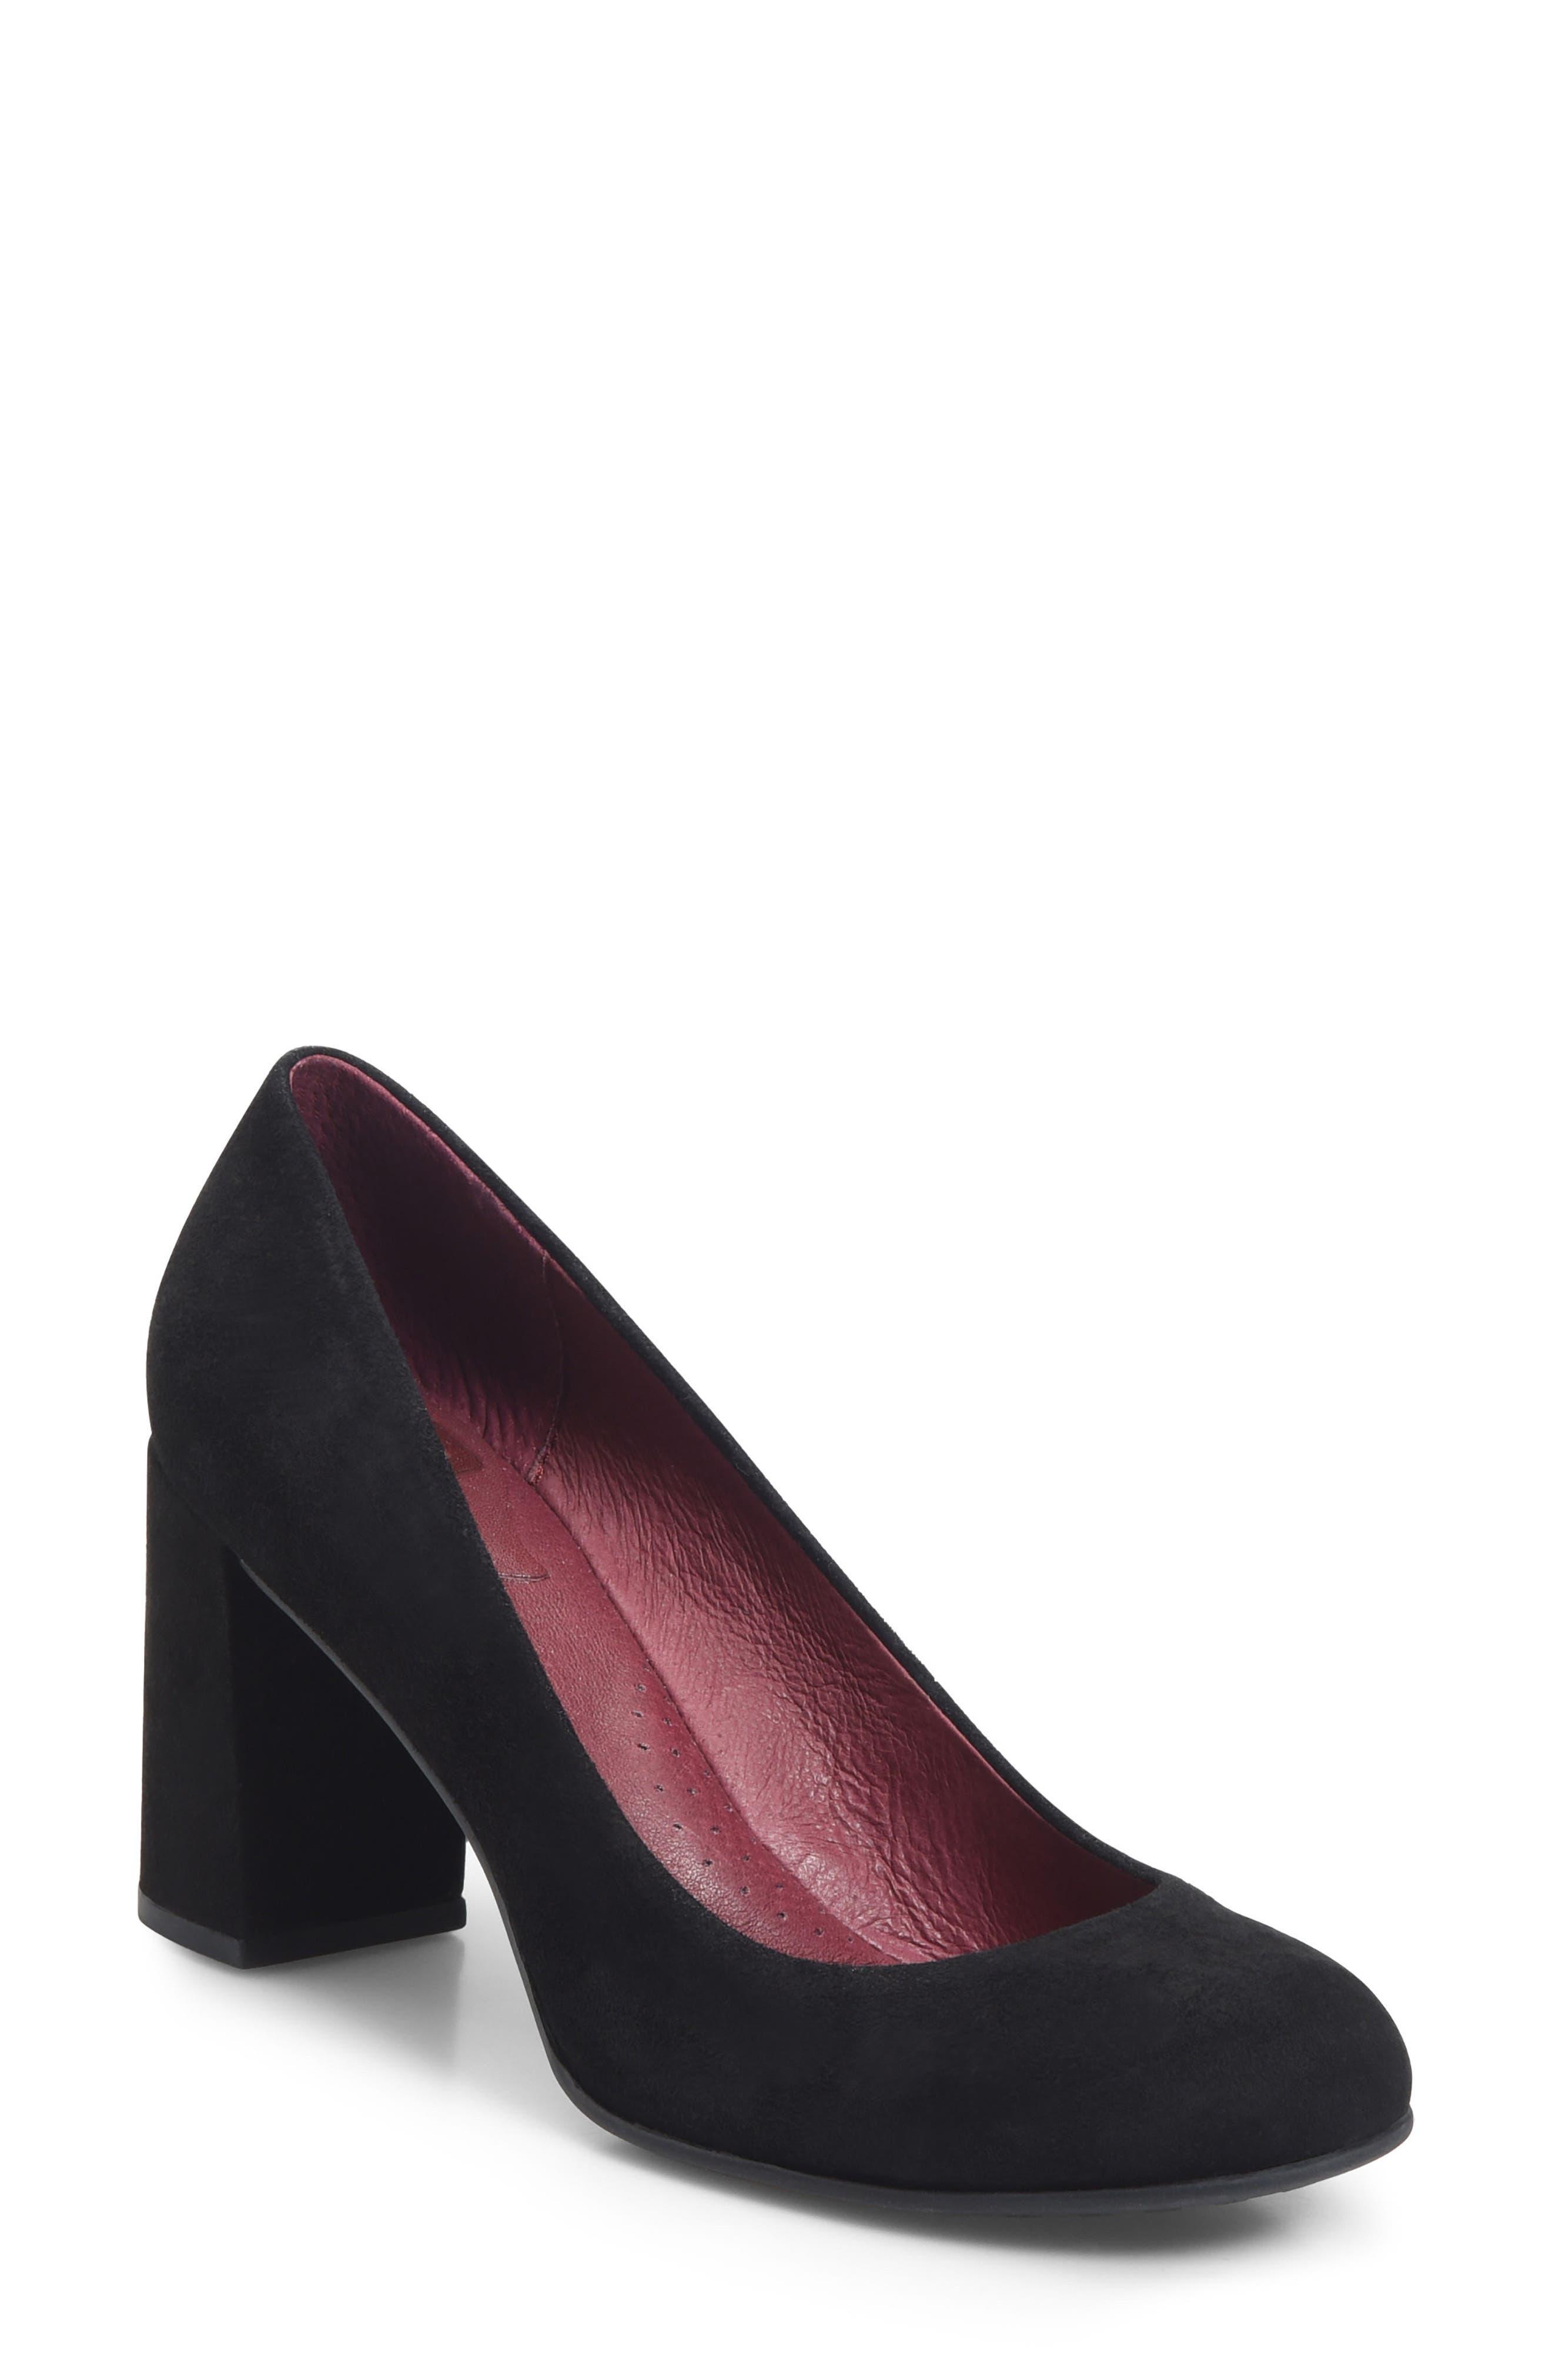 ONO Alpena Block Heel Pump (Women)